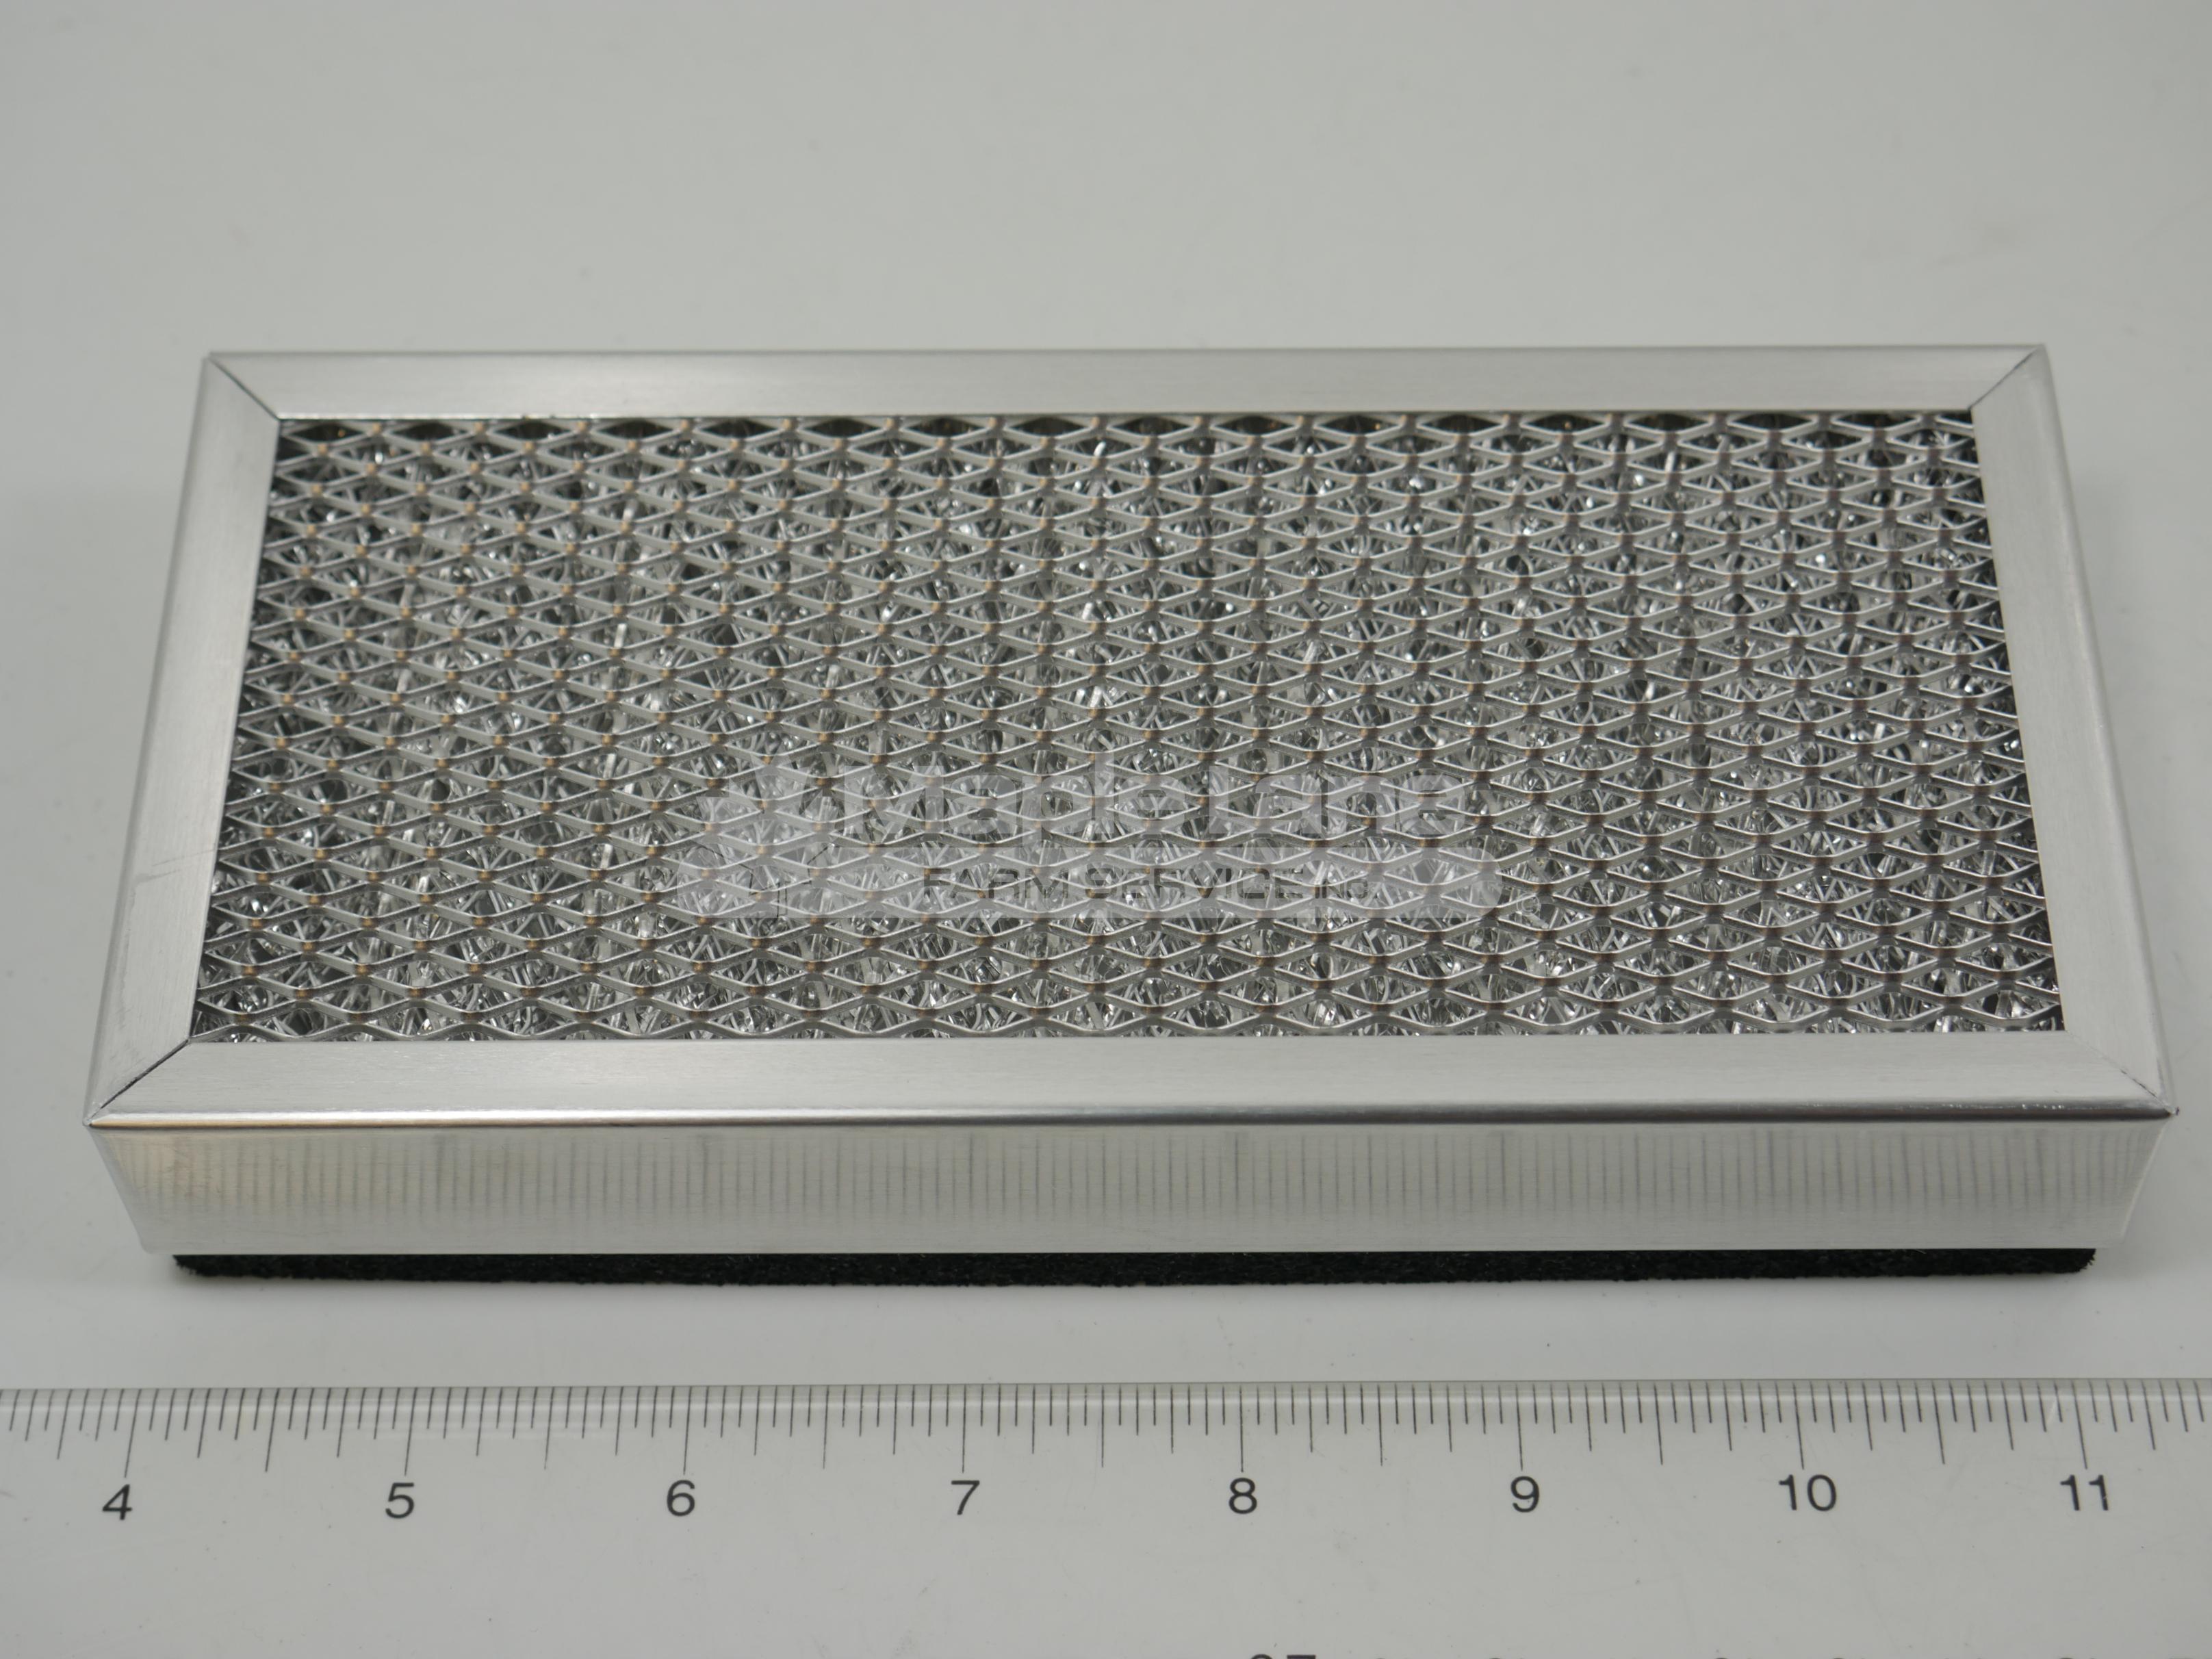 420-36247 Heater Filter